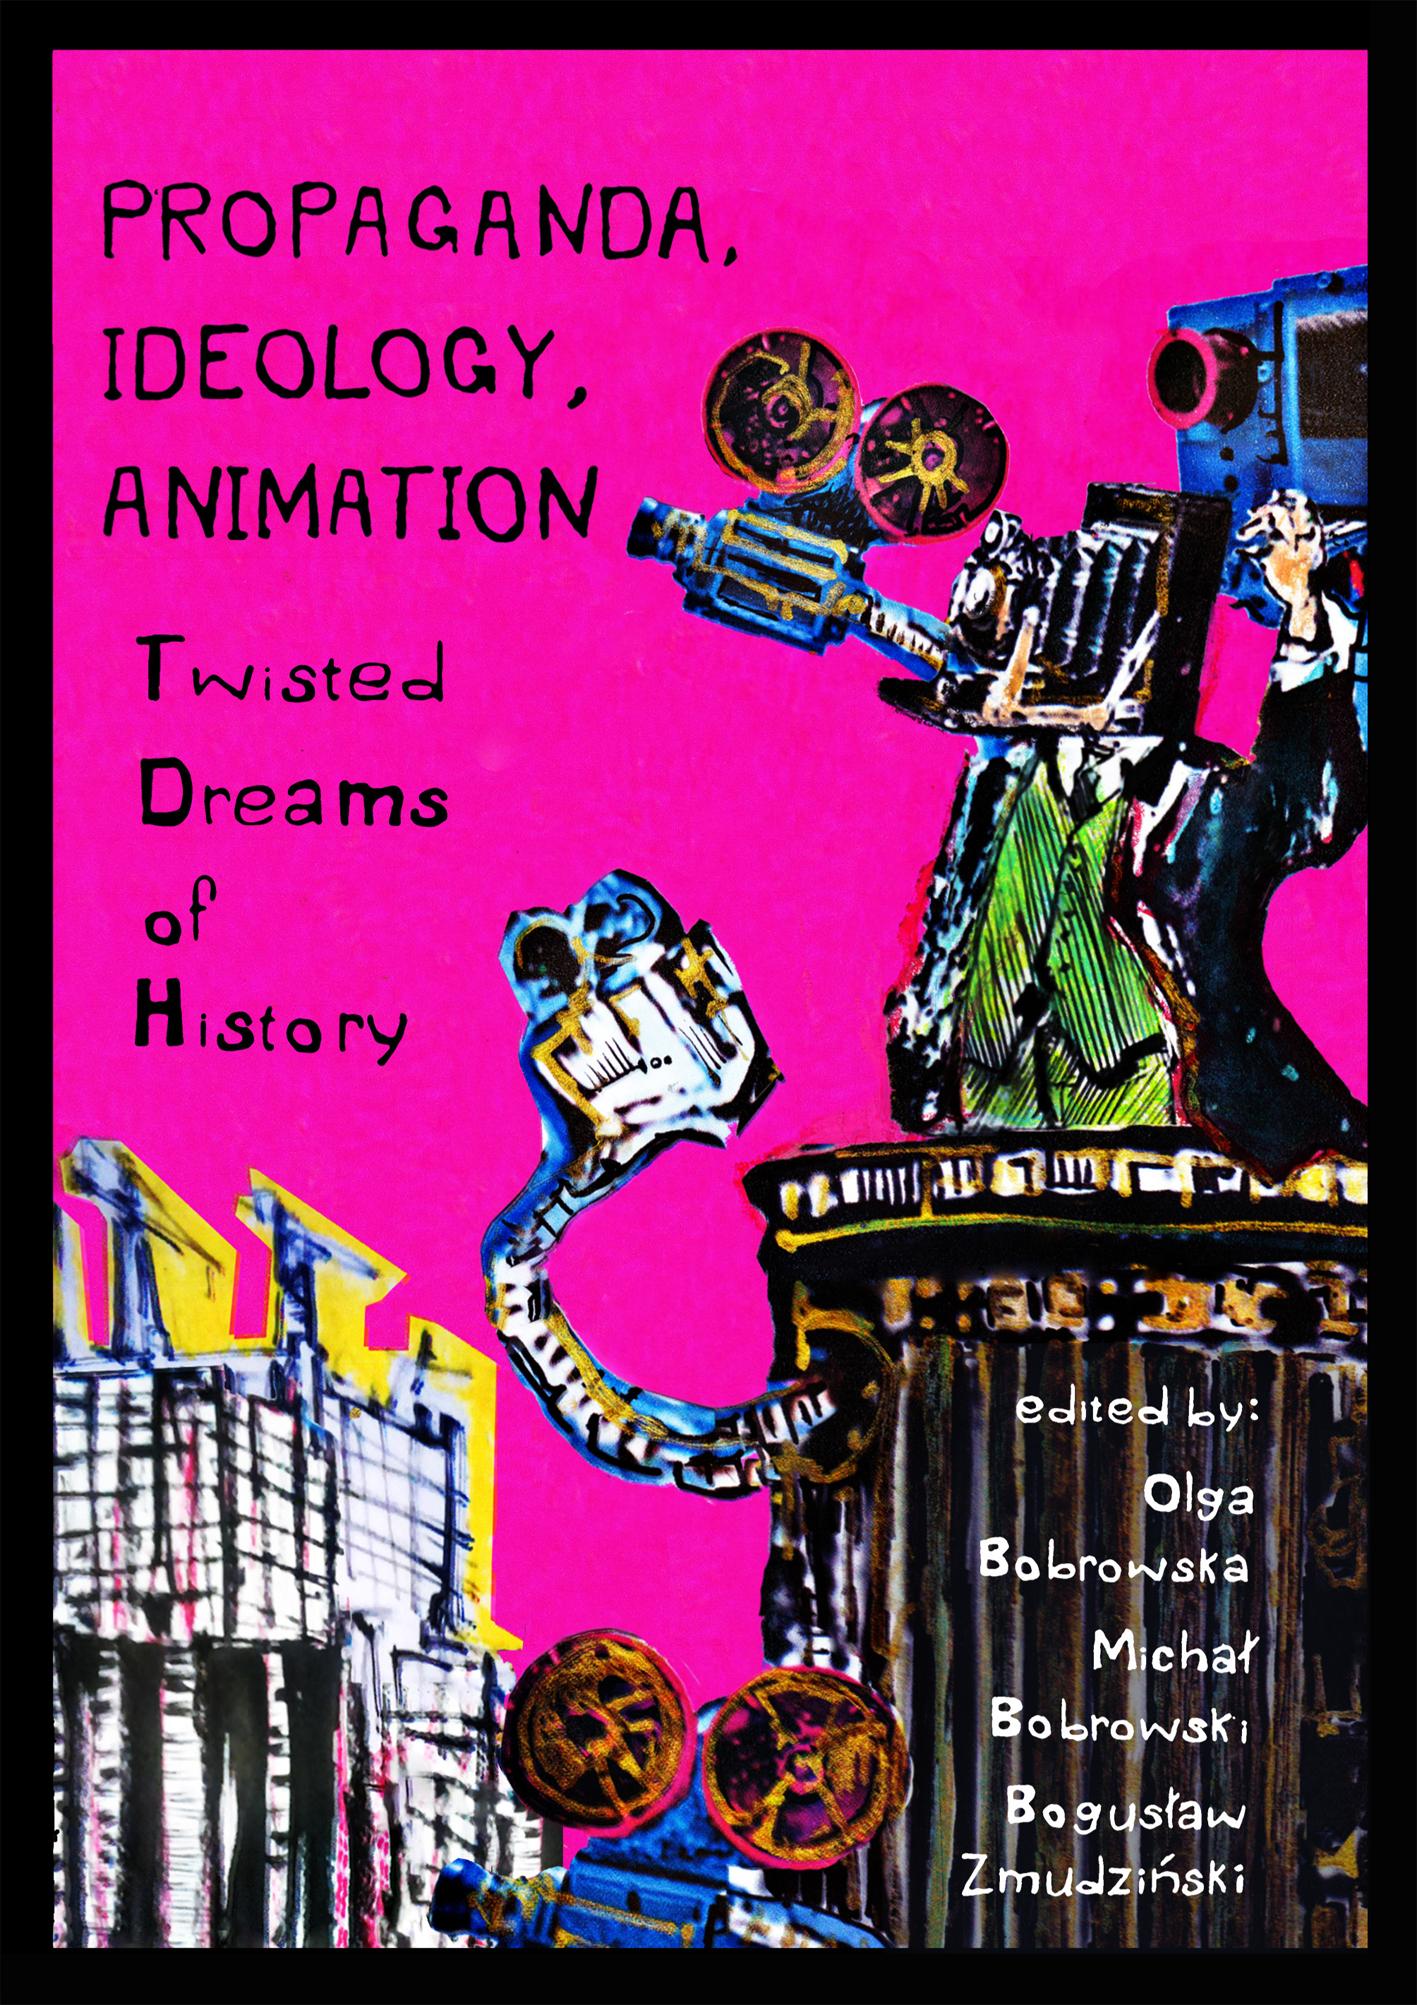 Propaganda Ideology Animation Twisted Dreams of History.jpg